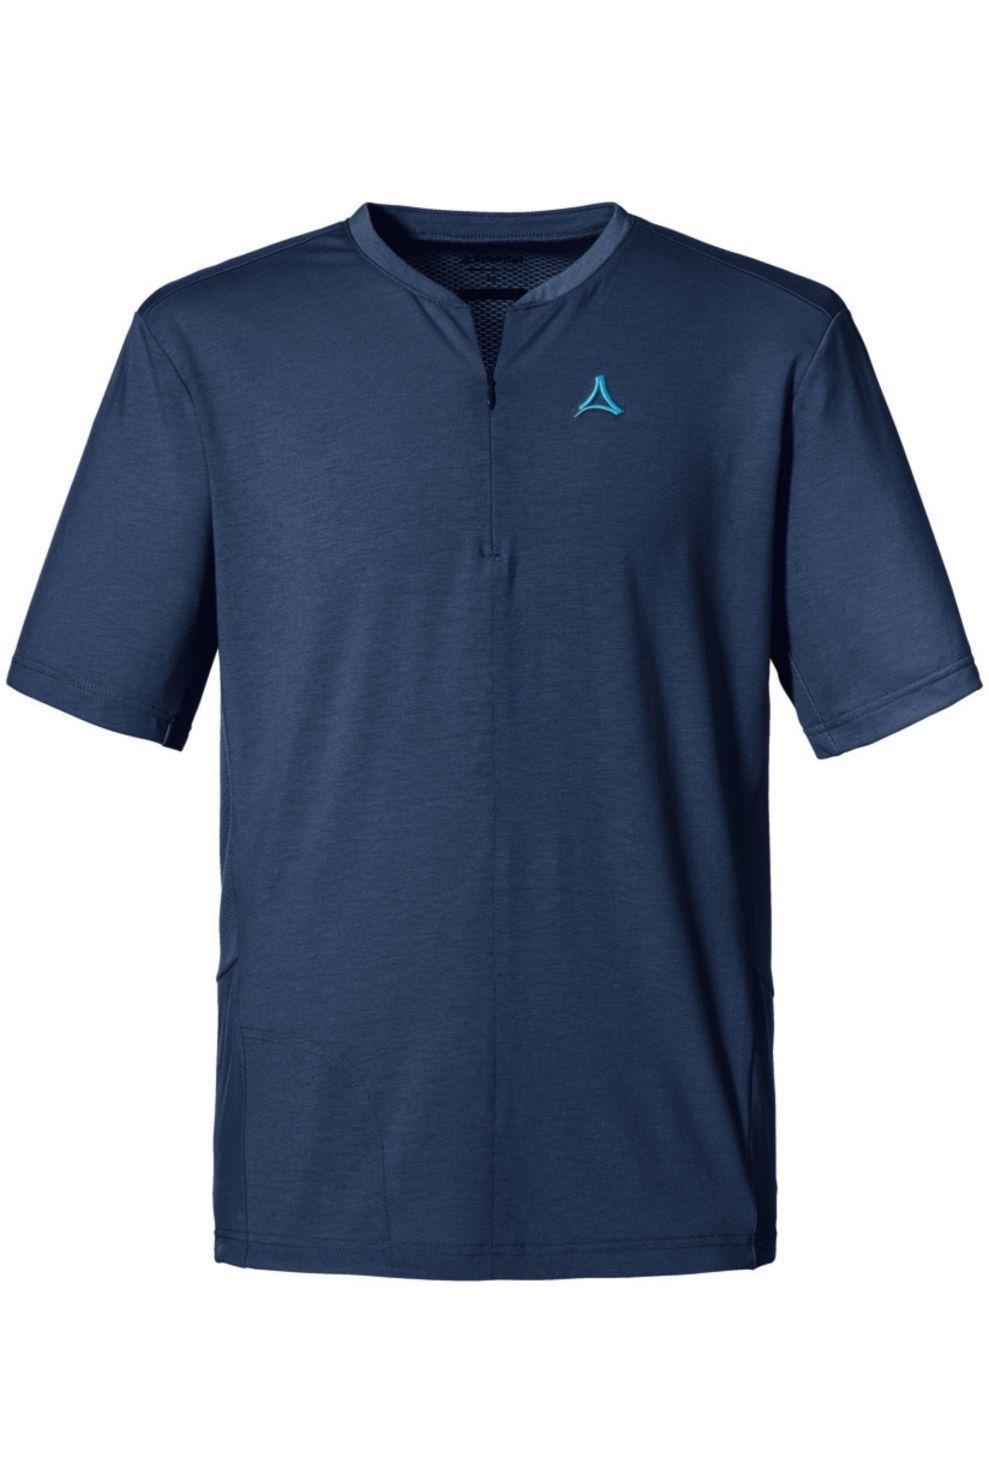 Schöffel T-Shirt Auvergne voor heren - Blauw/Zwart - Maten: 50, 52, 54